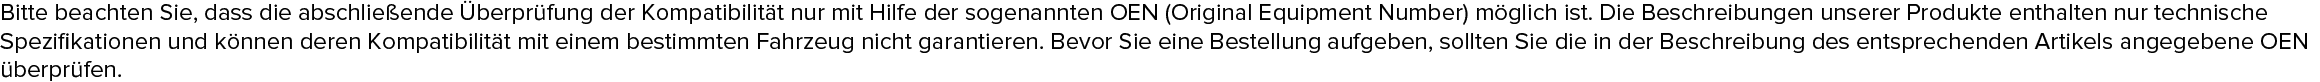 MAHLE ORIGINAL 13271121, 13271190, 13271191, 13503675, 13503677 Filter, Innenraumluft